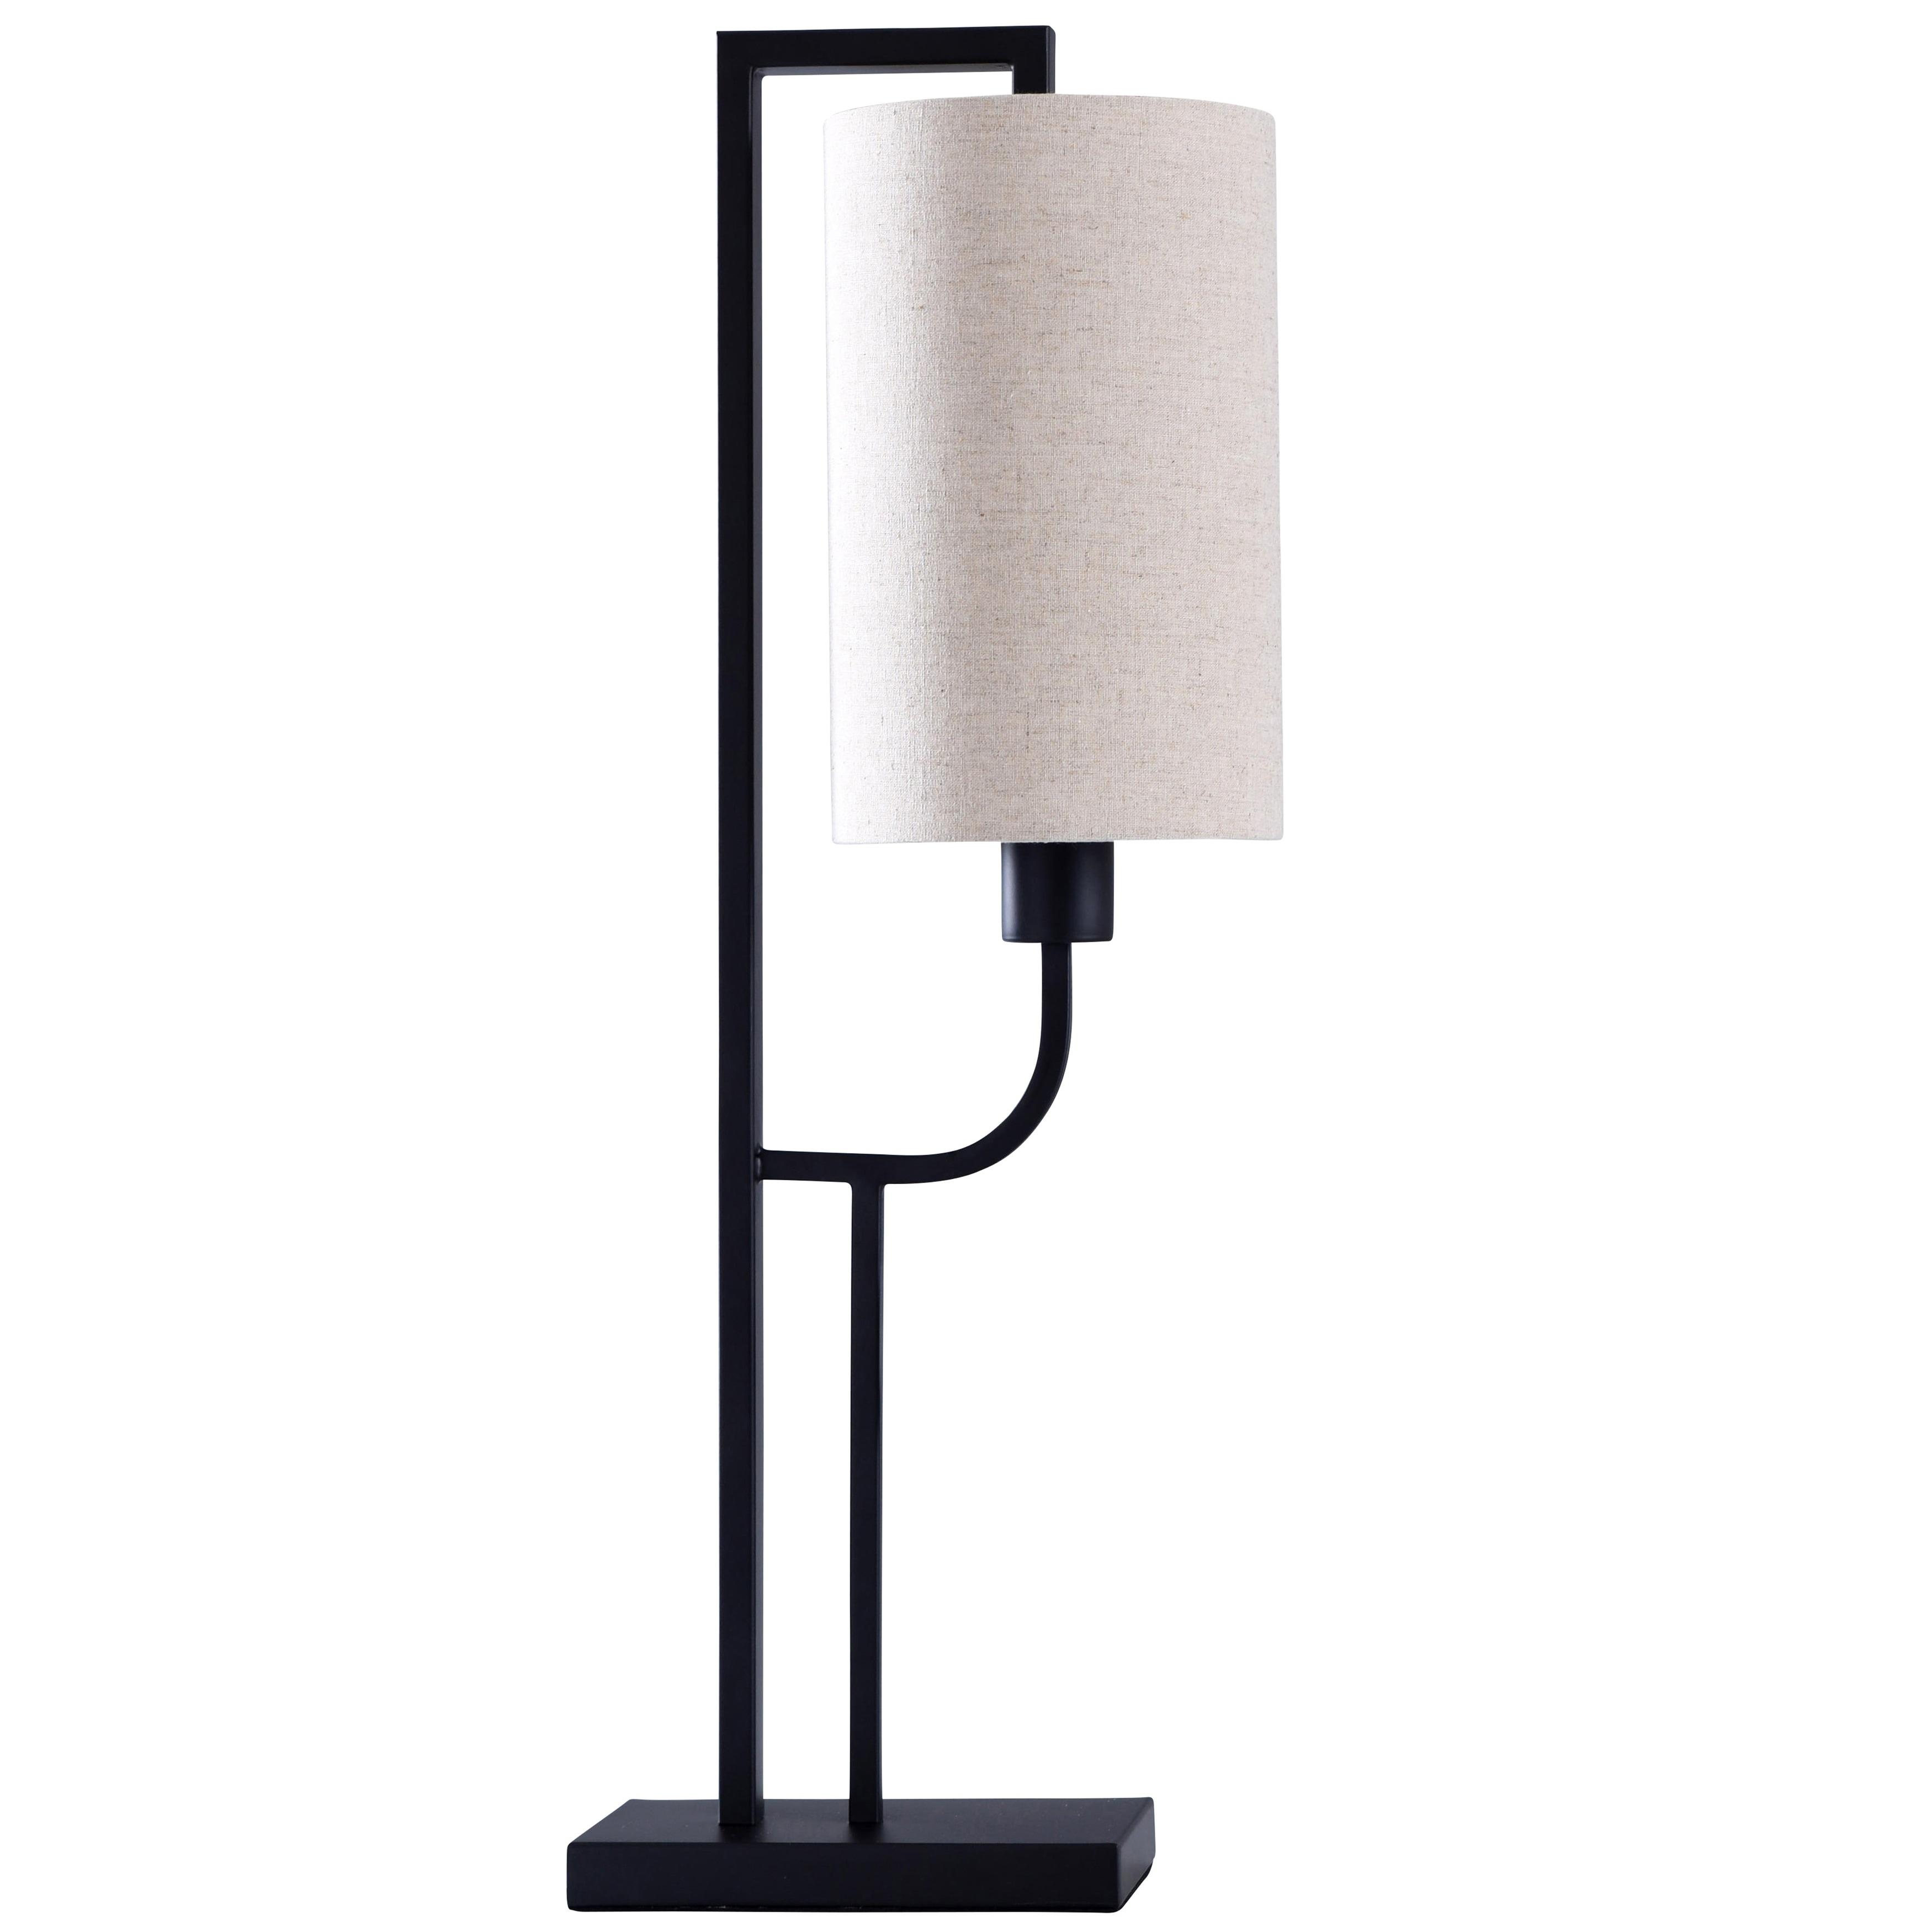 Orb Tall Black Table Lamp Off